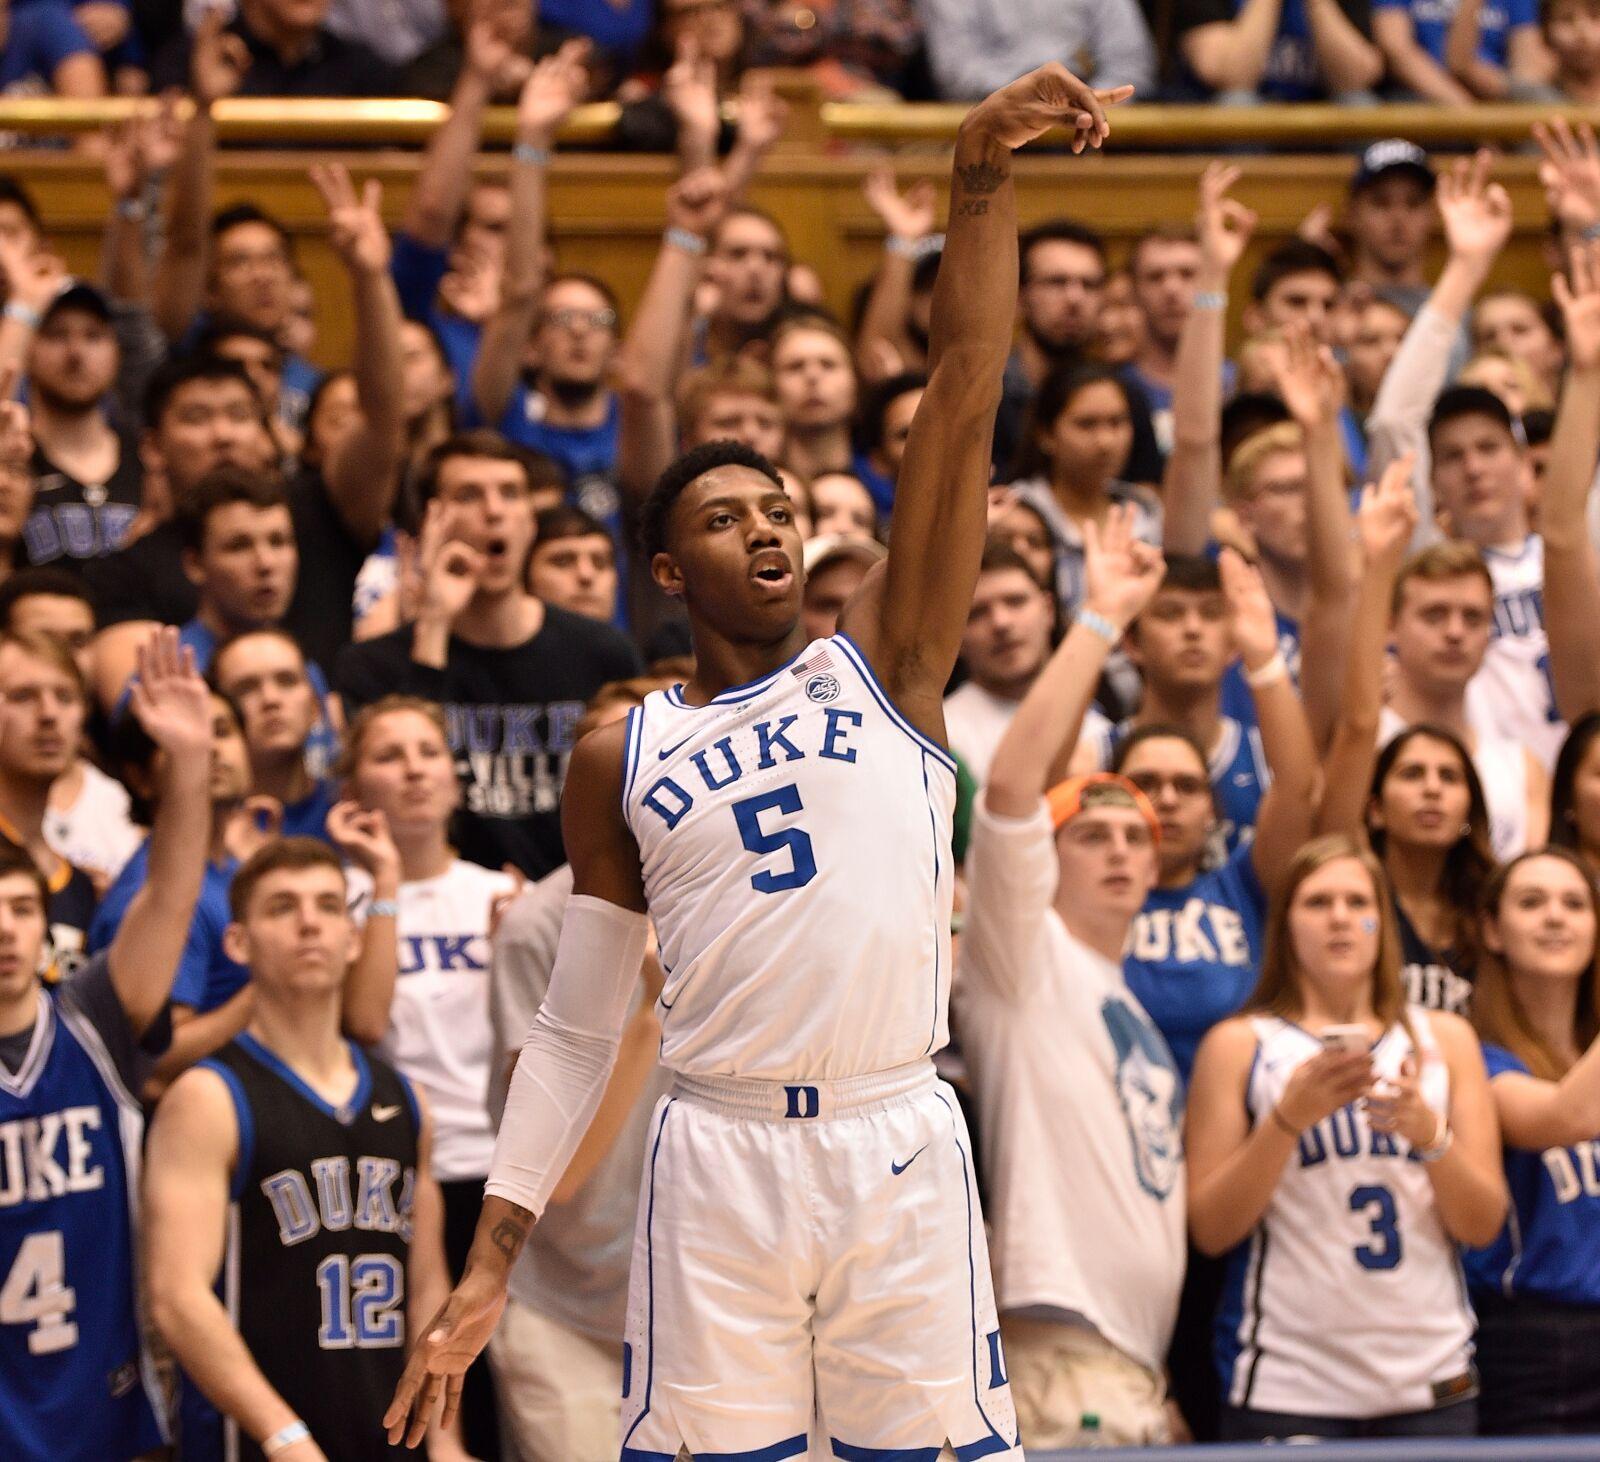 Duke Basketball: R.J. Barrett's triple-double keeps NC State at bay